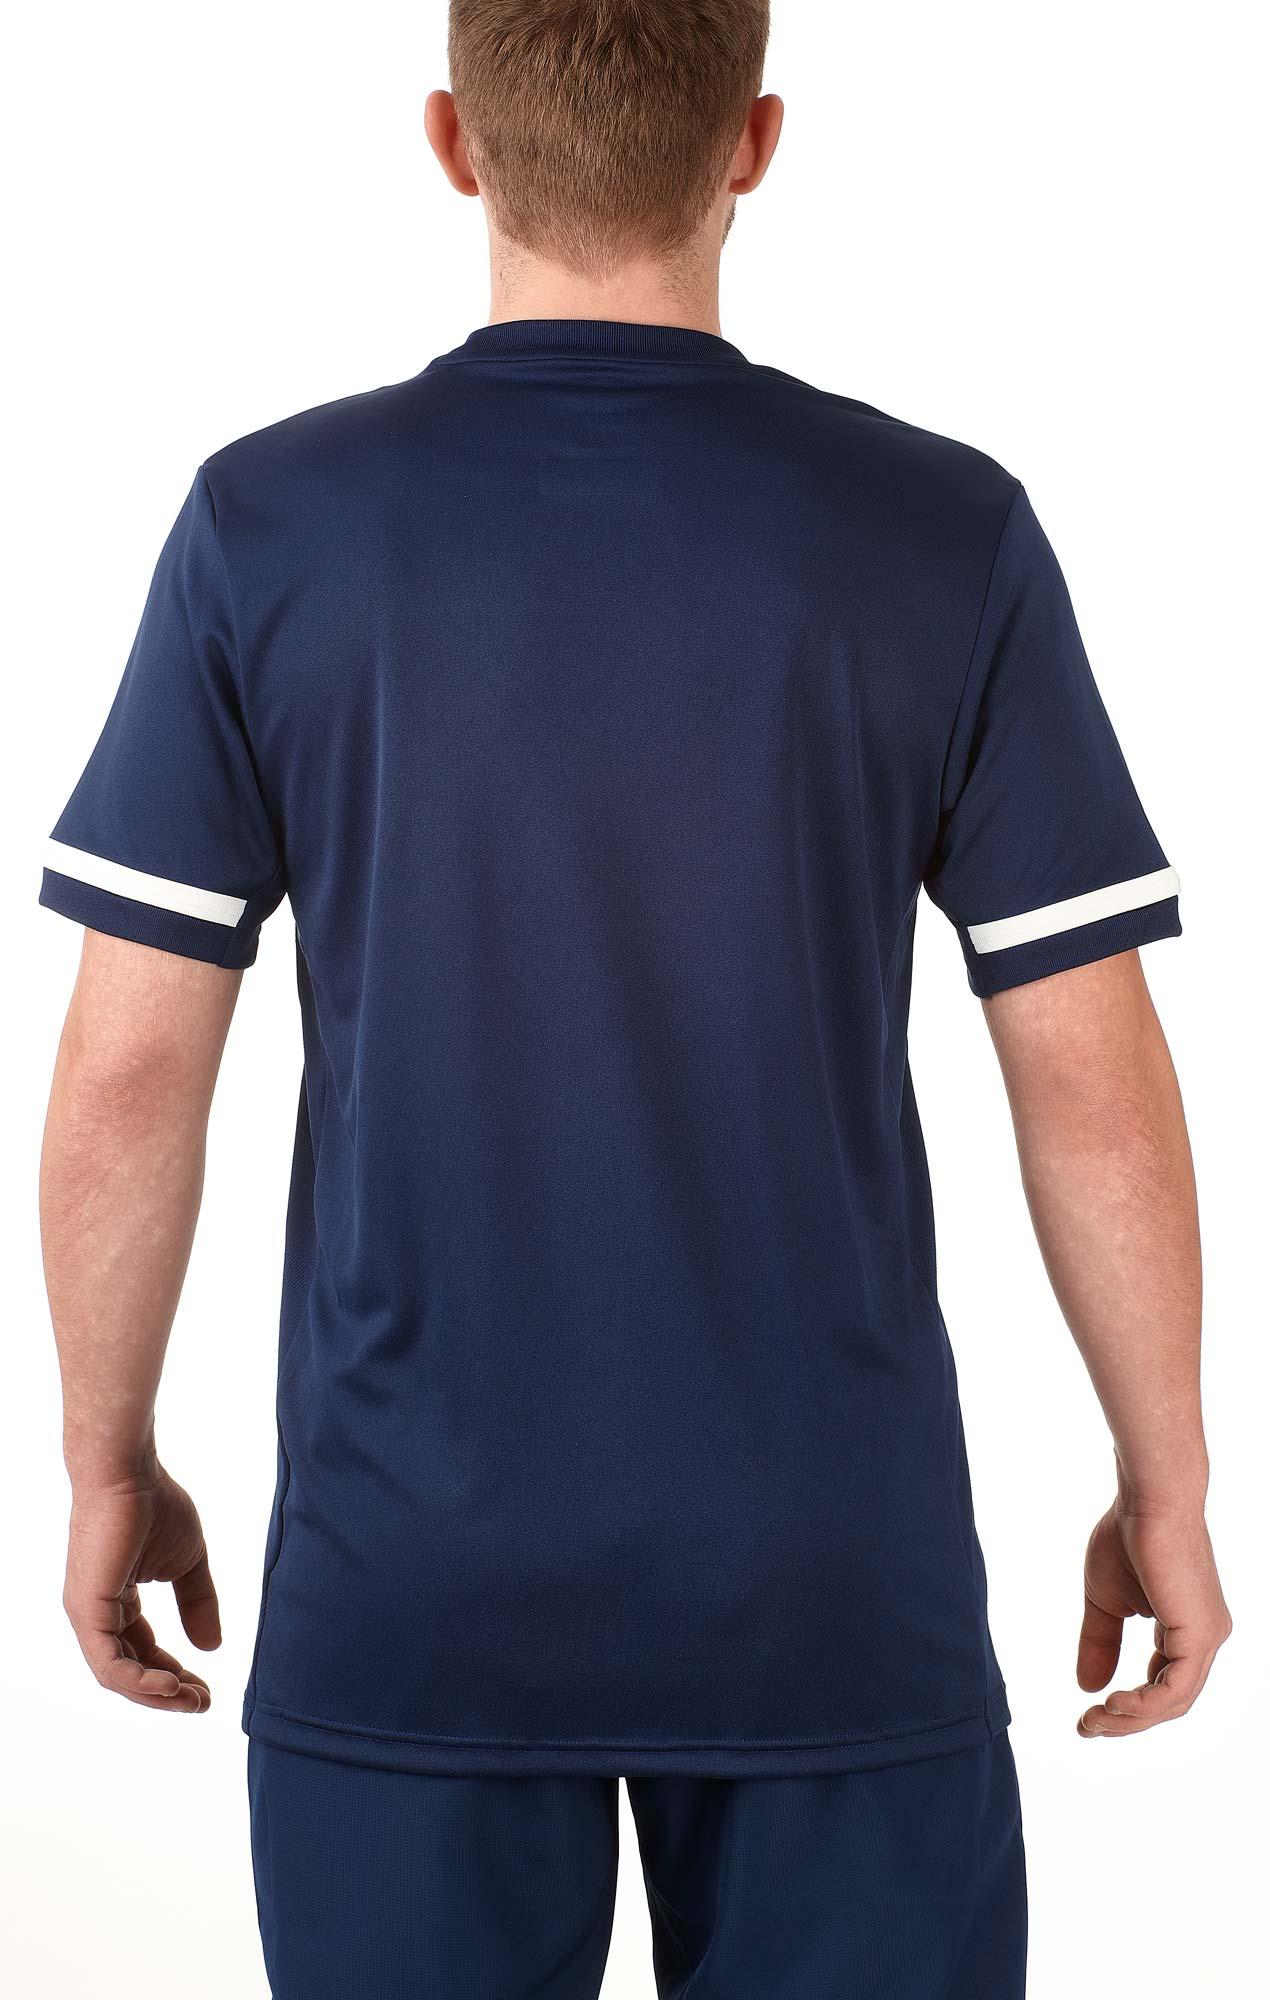 adidas T19 Shortsleeve Jersey Männer blauweiß, DY8852